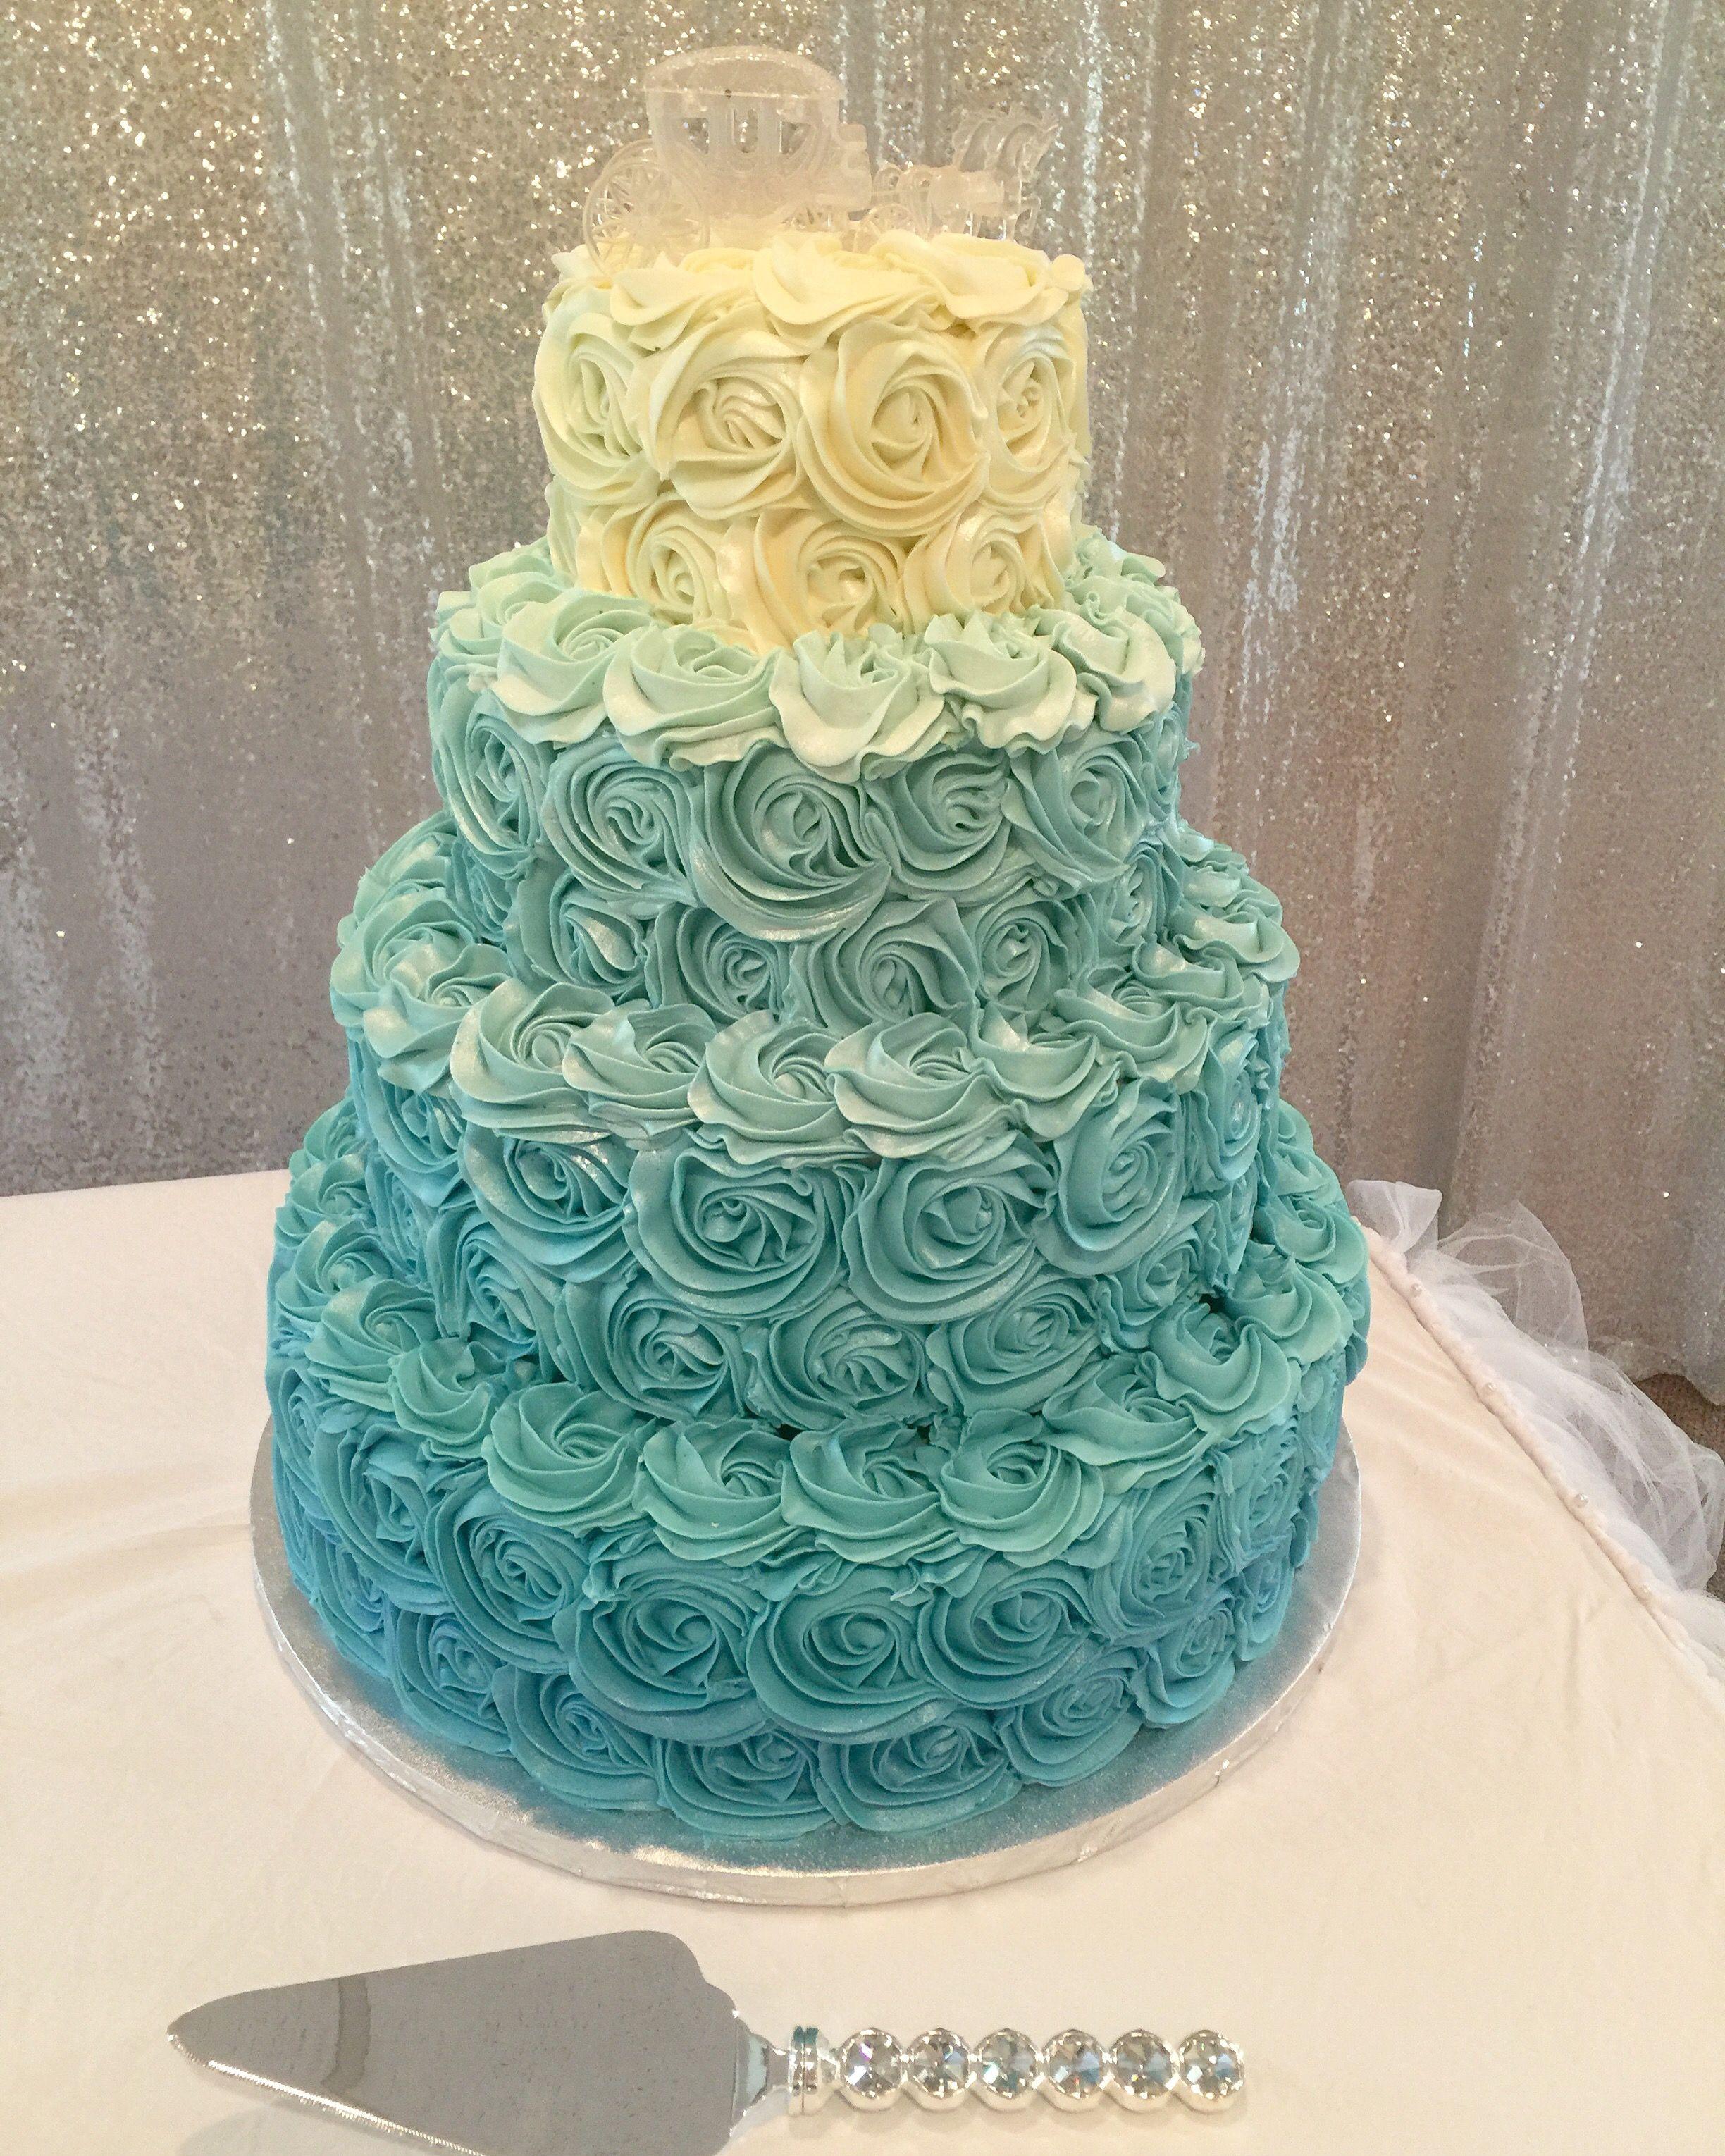 Ombre Blue Rosette Cake Chocolate Wedding Cake Sweet 16 Birthday Cake Wedding Cake Photos